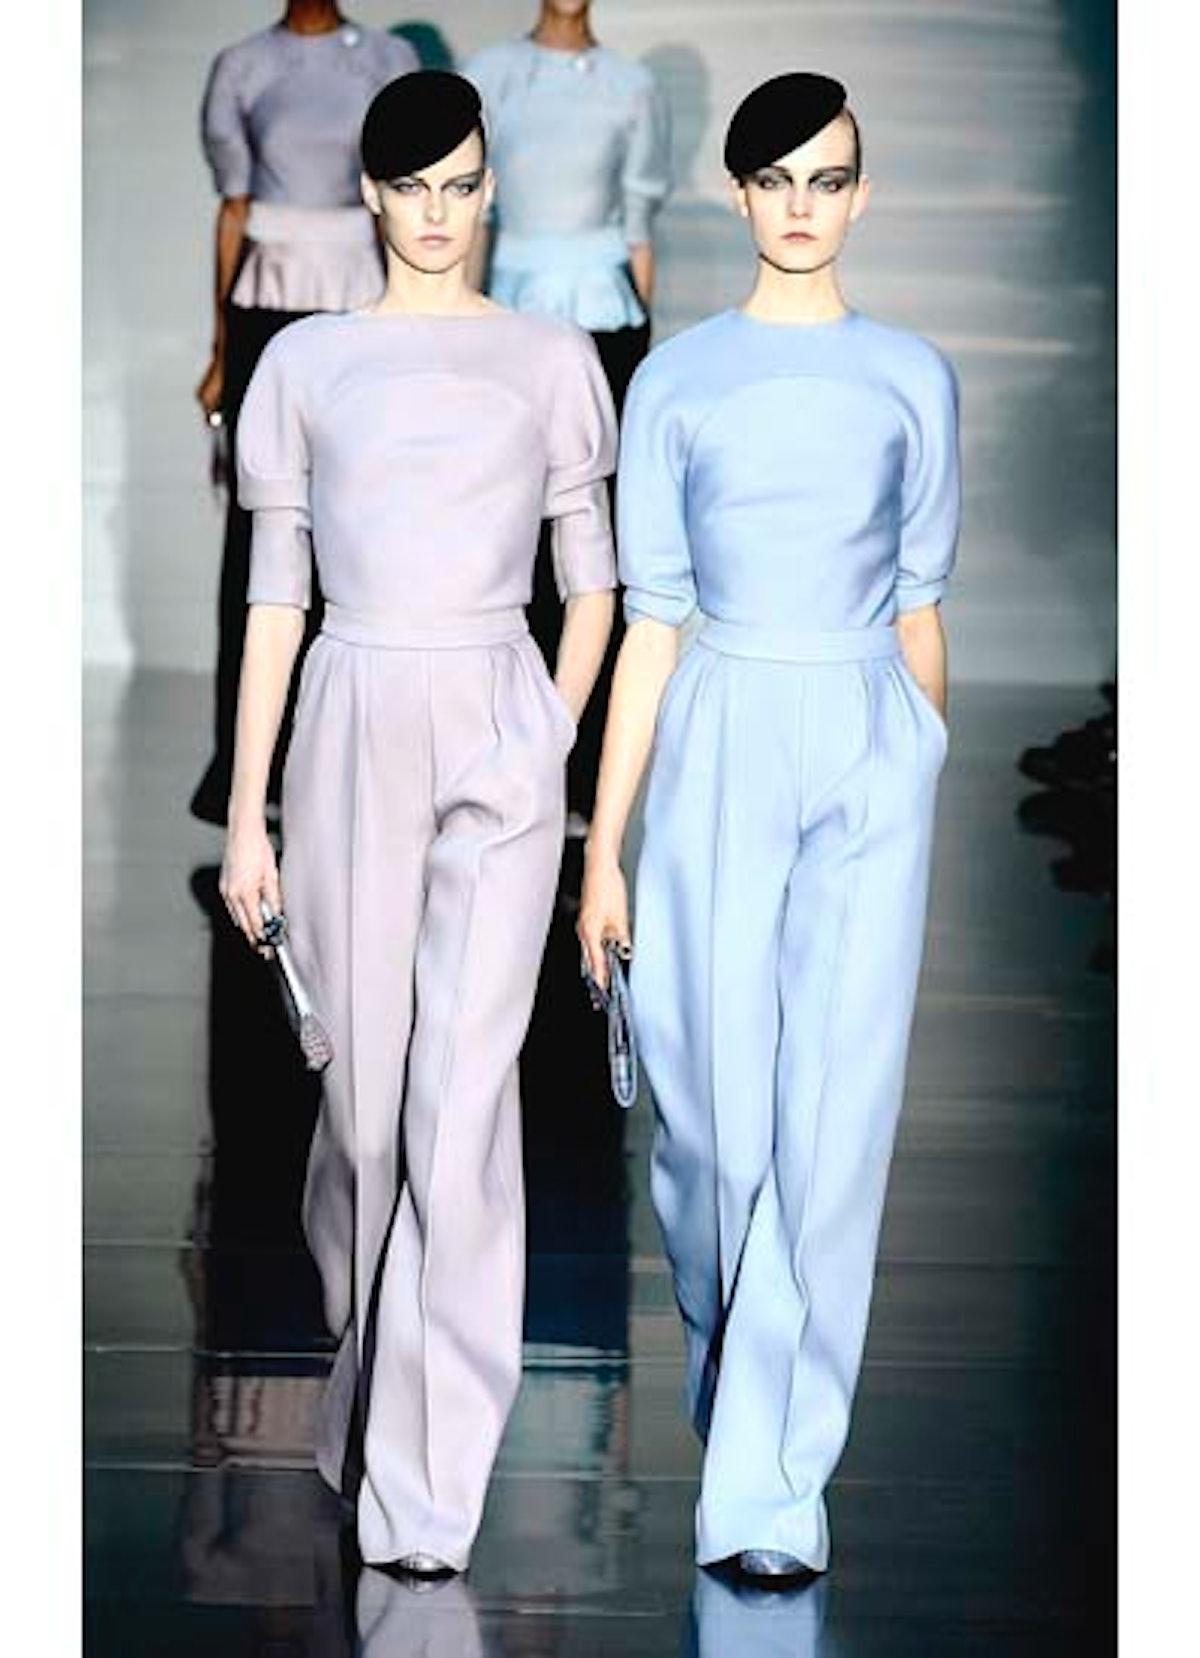 fass-giorgio-armani-couture-2012-runway-04-v.jpg